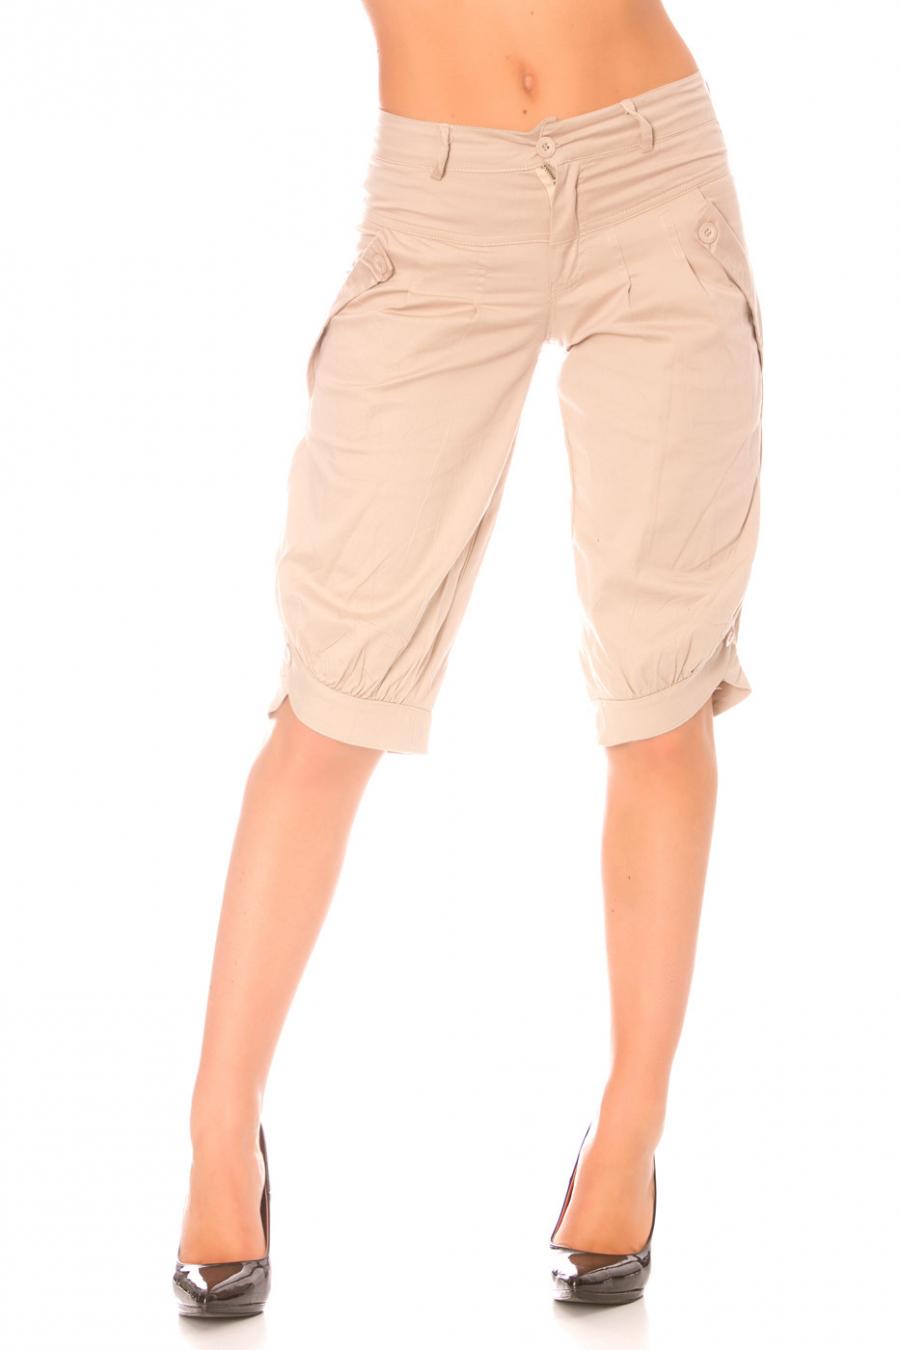 Beige capri pants with pockets.